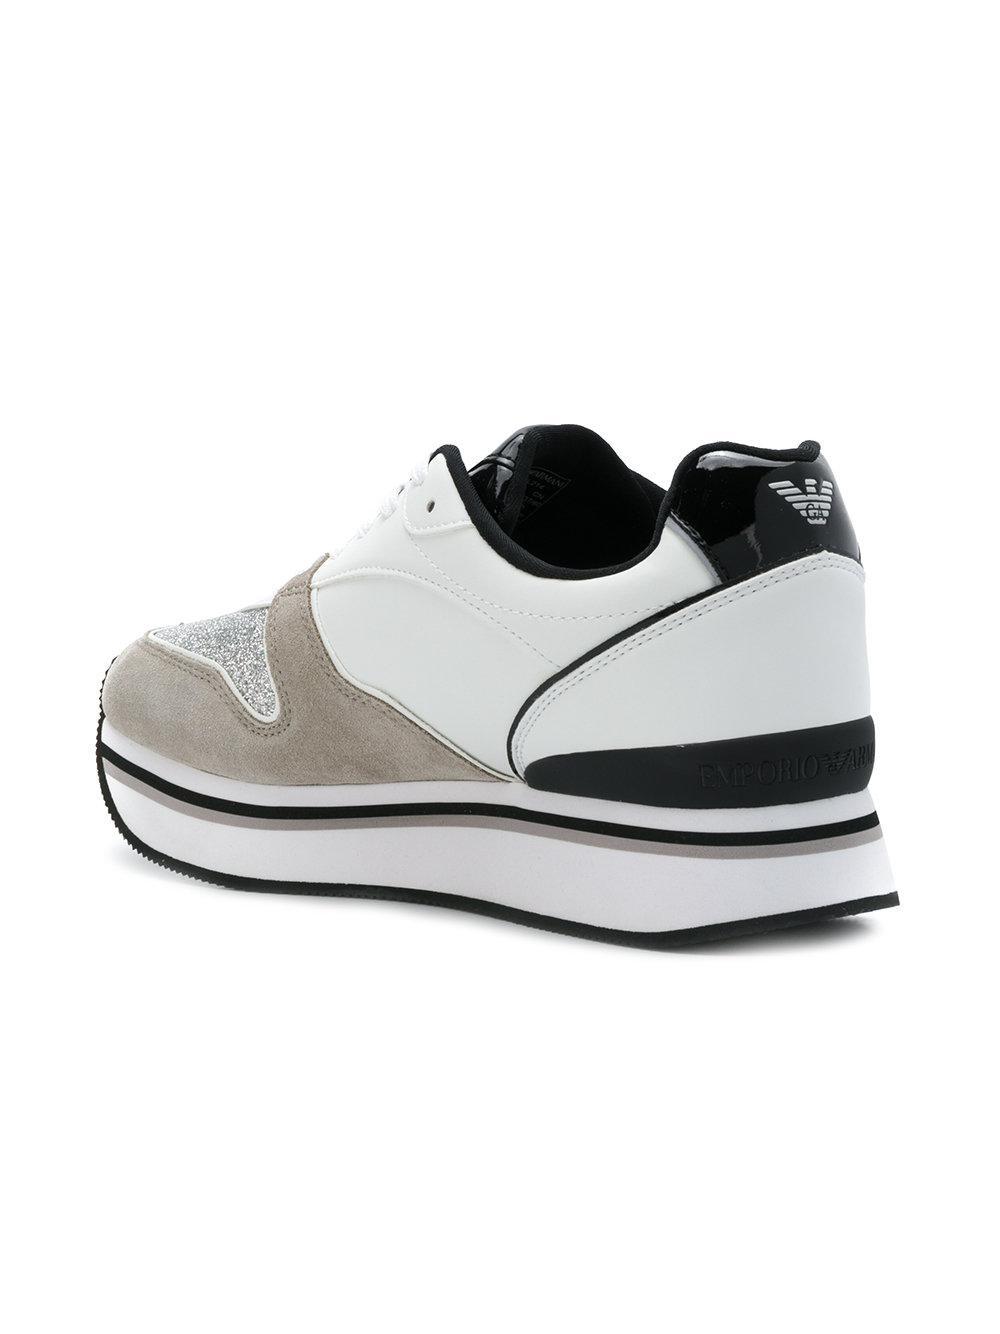 timeless design 0e551 1b965 emporio-armani-White-Platform-Runner-Sneakers.jpeg